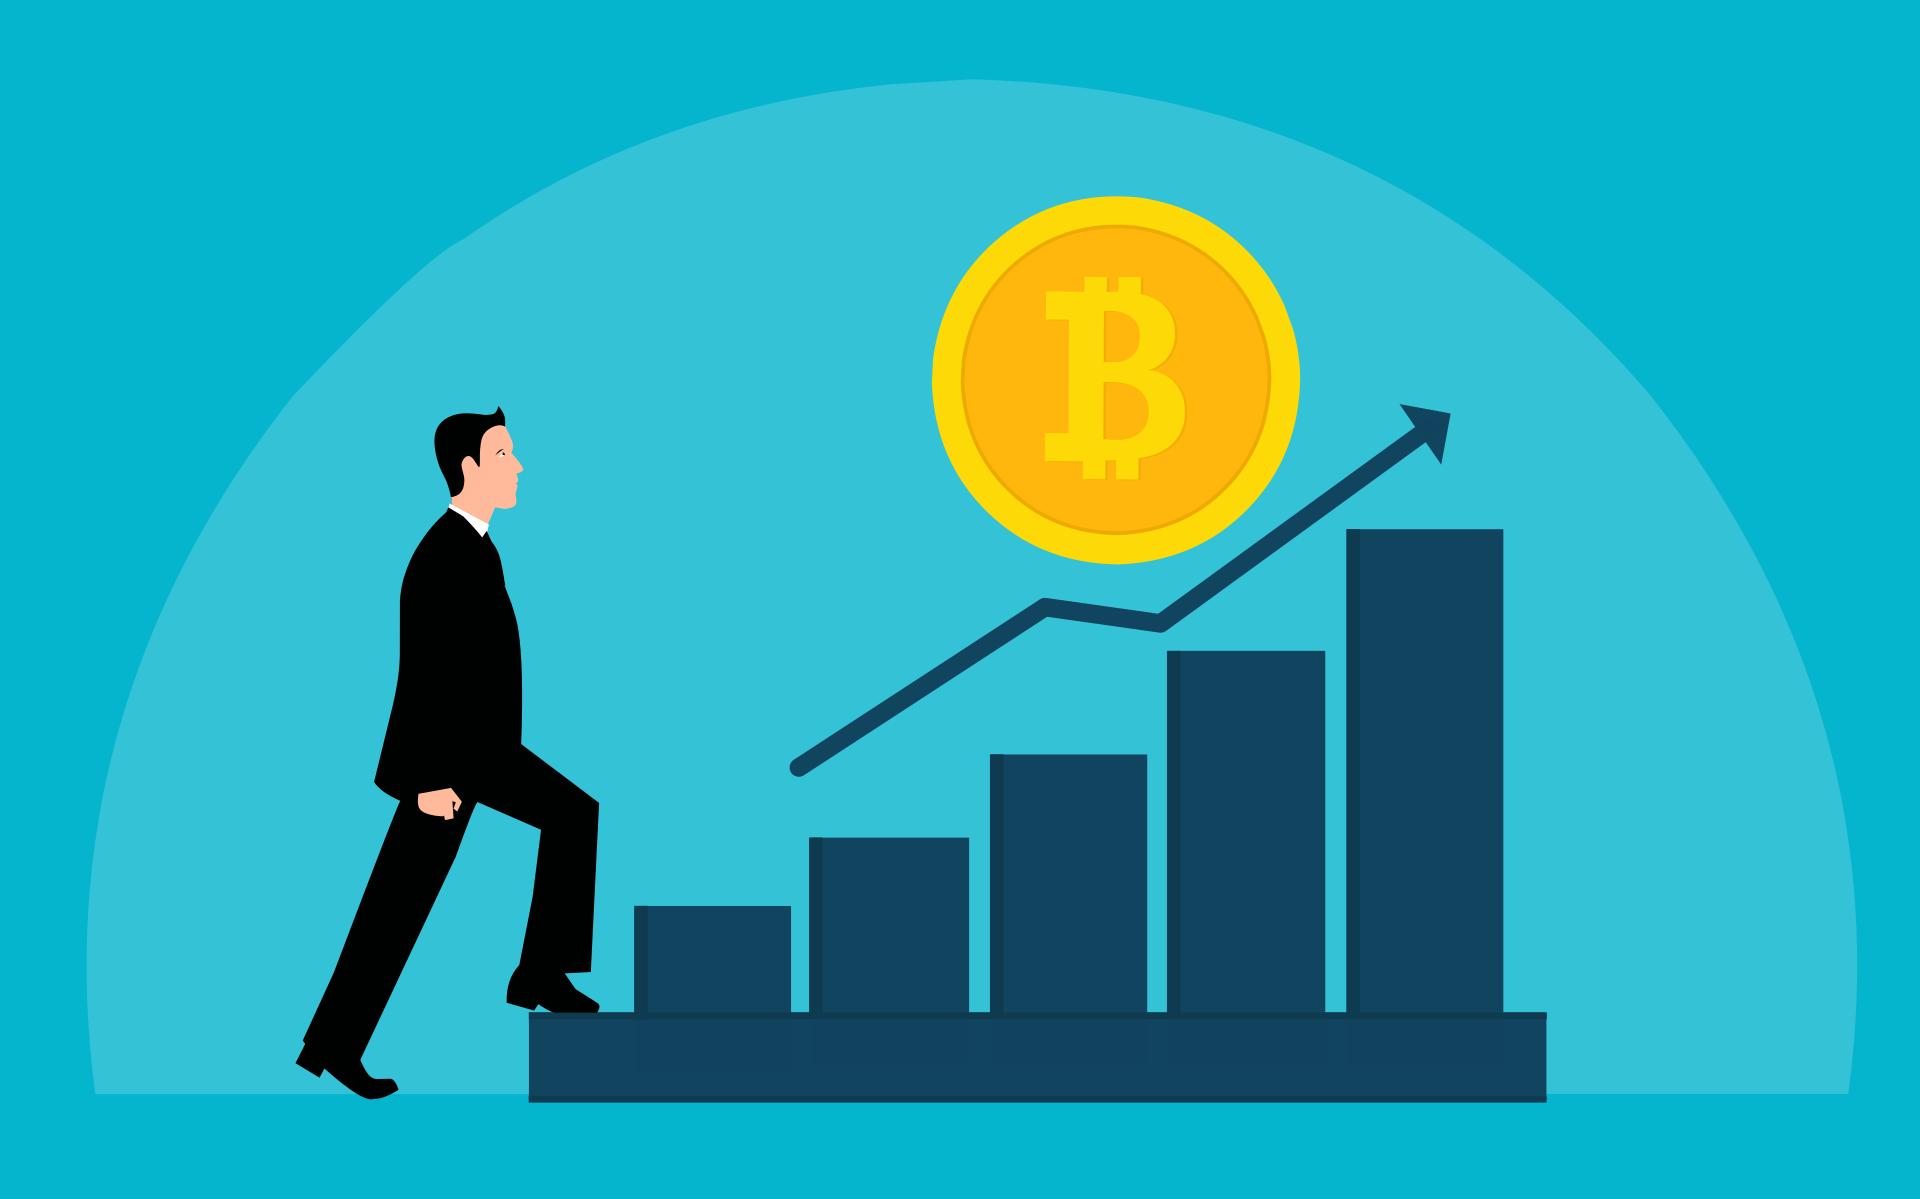 Comprar bitcoins okpay complaints soccerbot draw betting